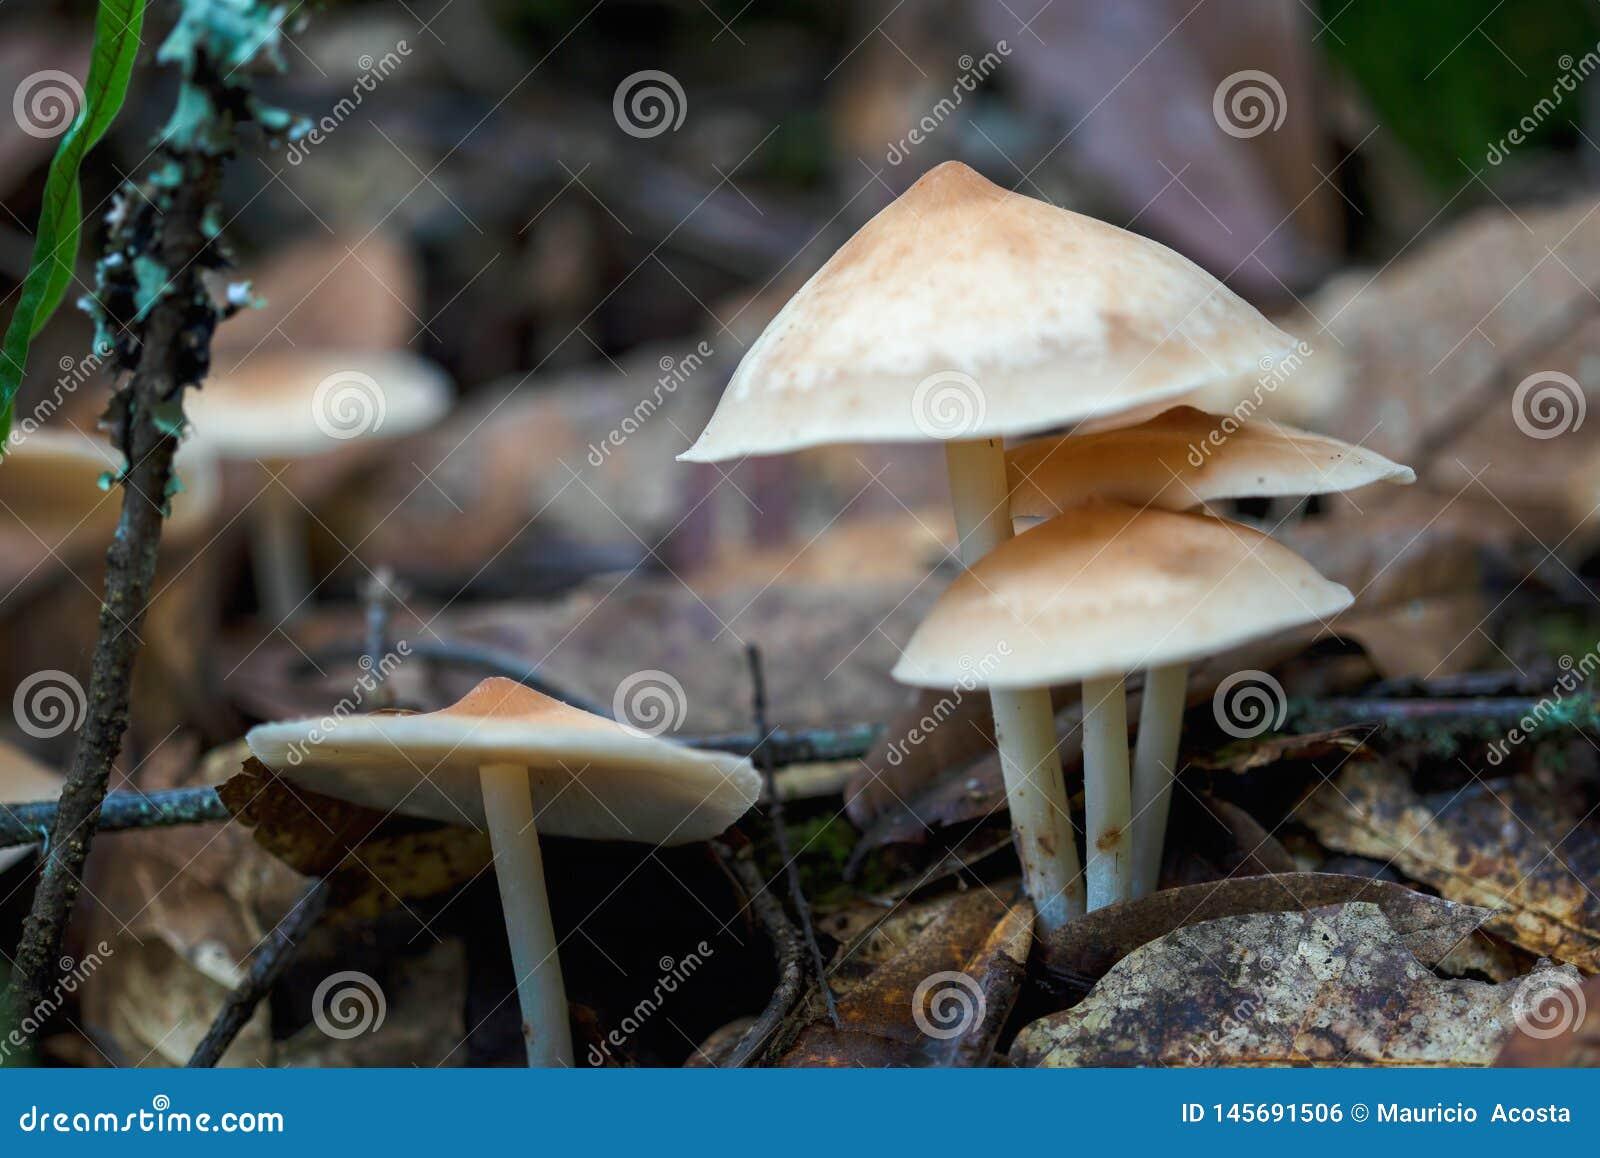 Four gymnopus mushrooms on the soil